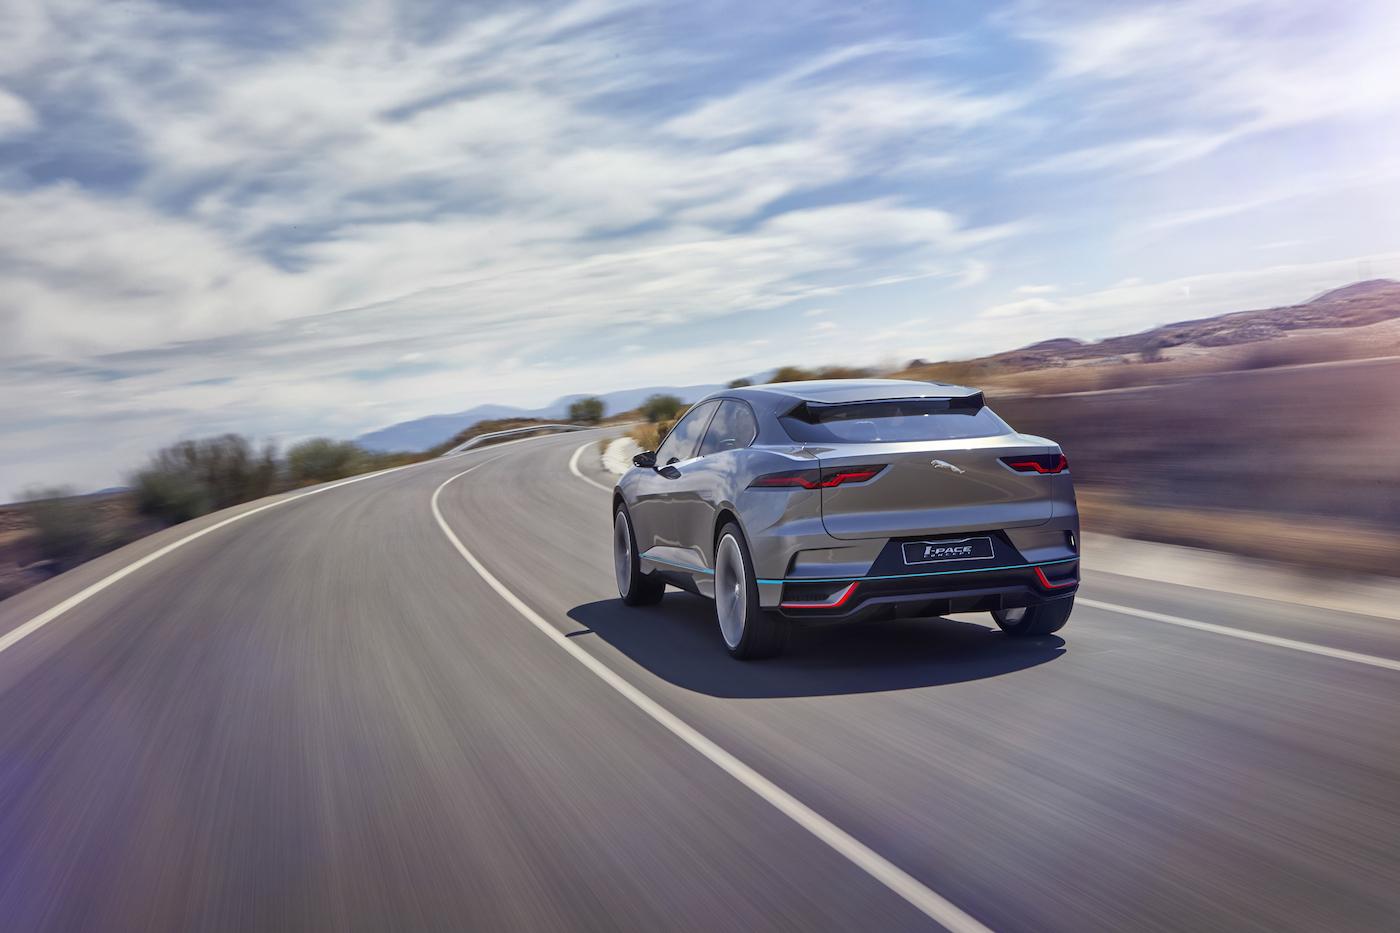 Der neue i-Pace: So will Jaguar Tesla & Co. angreifen 4